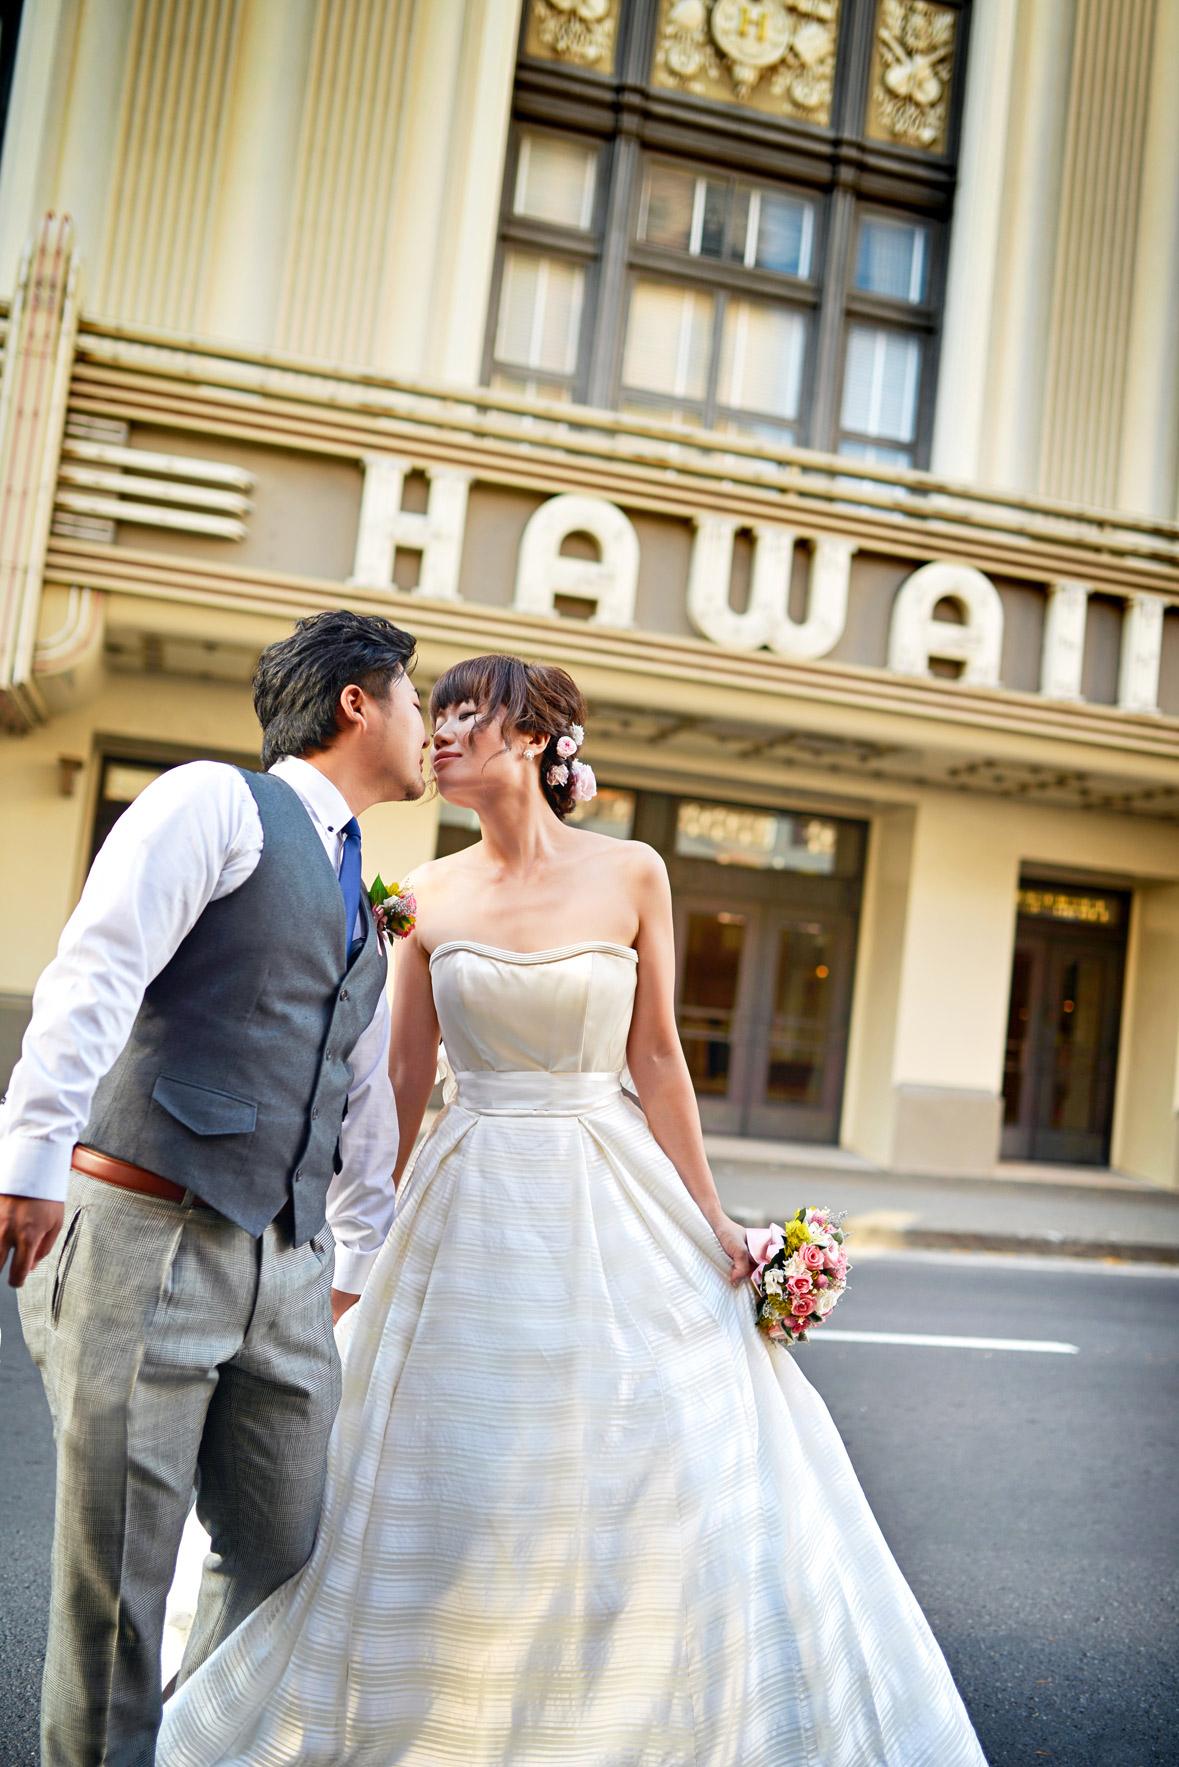 waikiki-beach-wedding-and-downtown-honolulu-hawaii-theater-stephen-ludwig-photography030.jpg